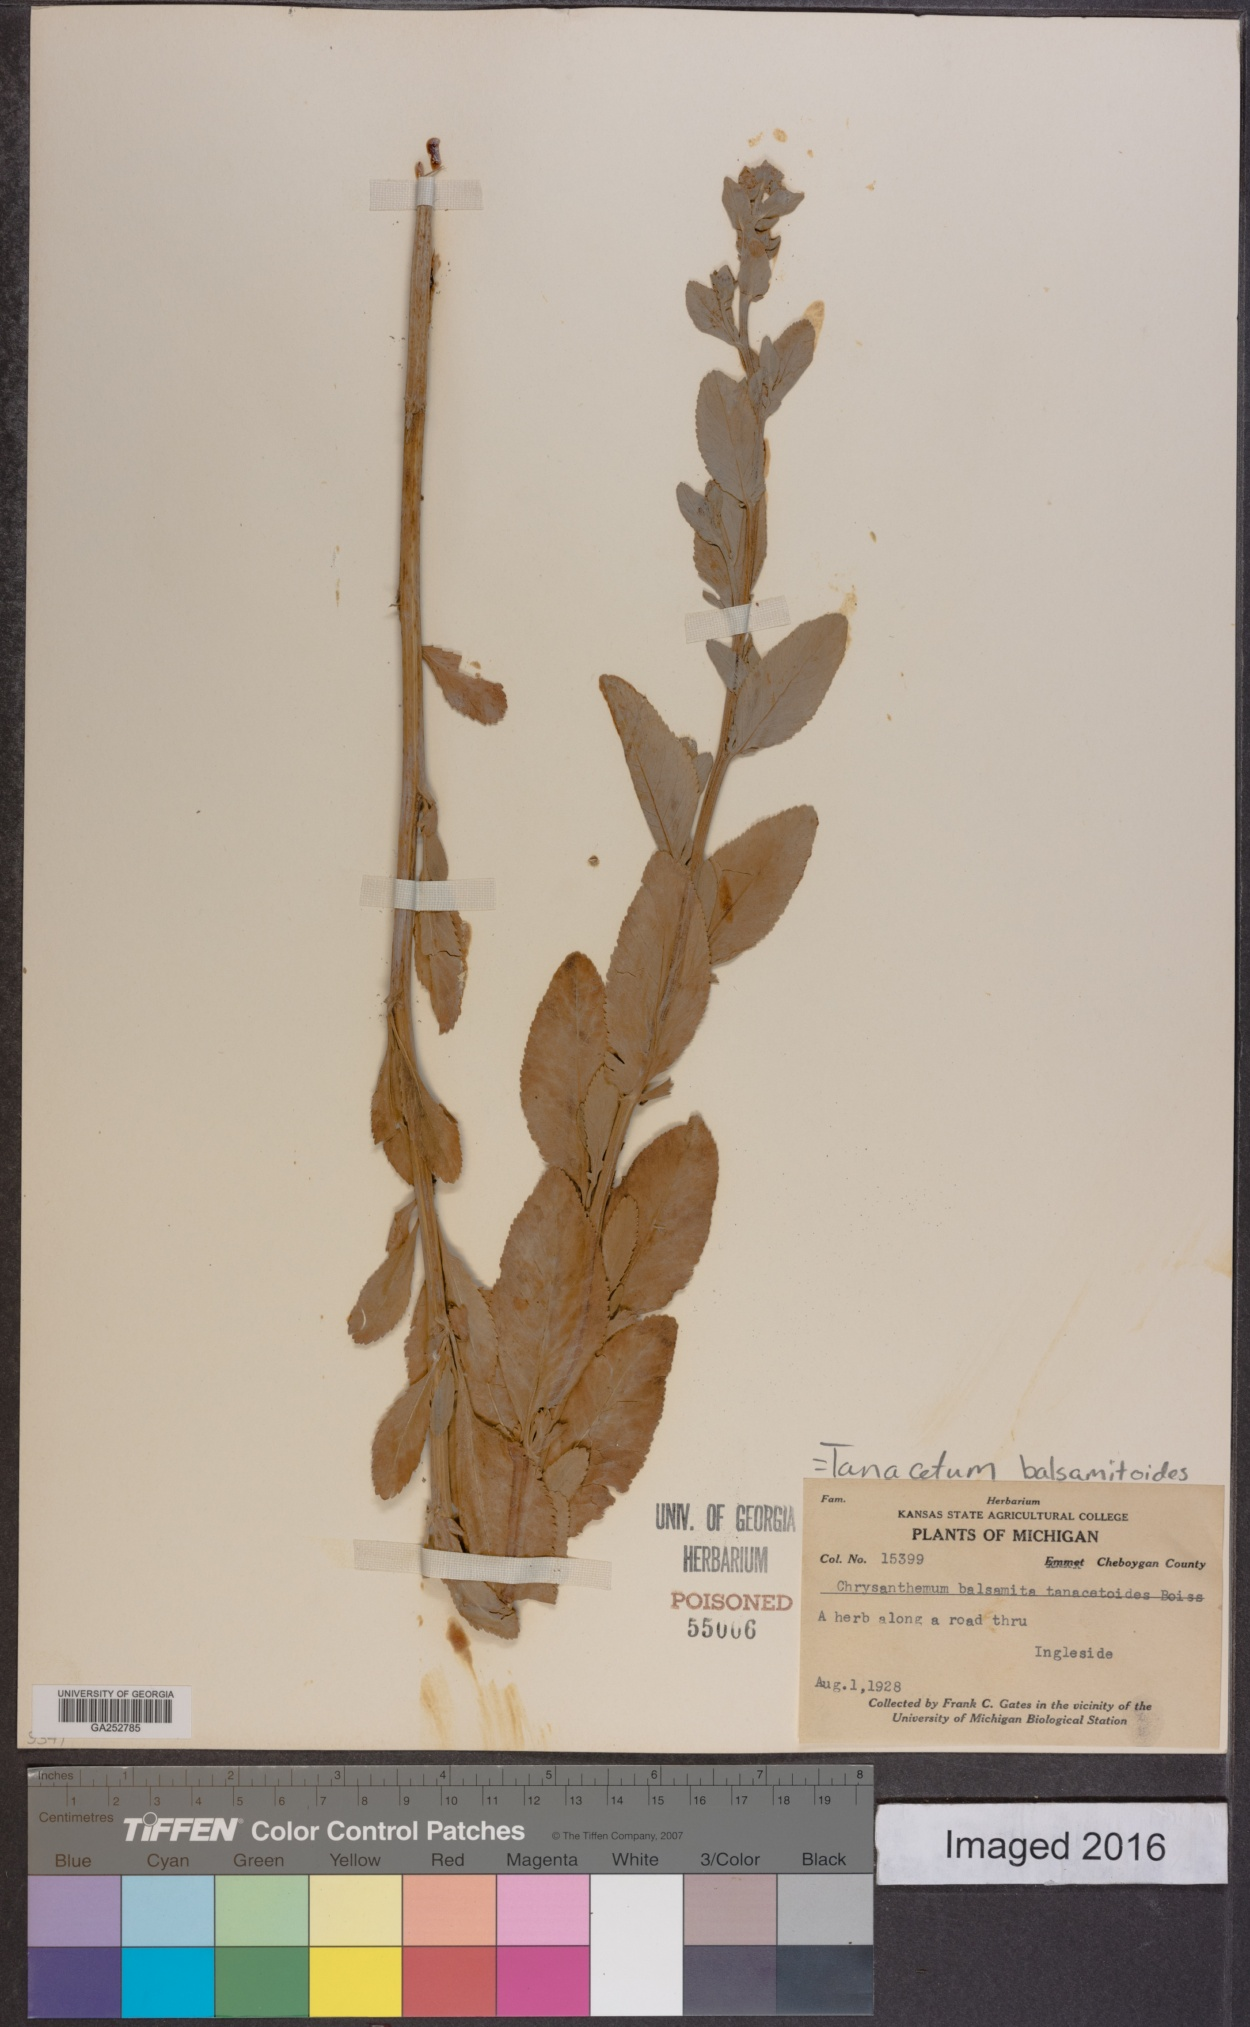 Tanacetum balsamitoides image